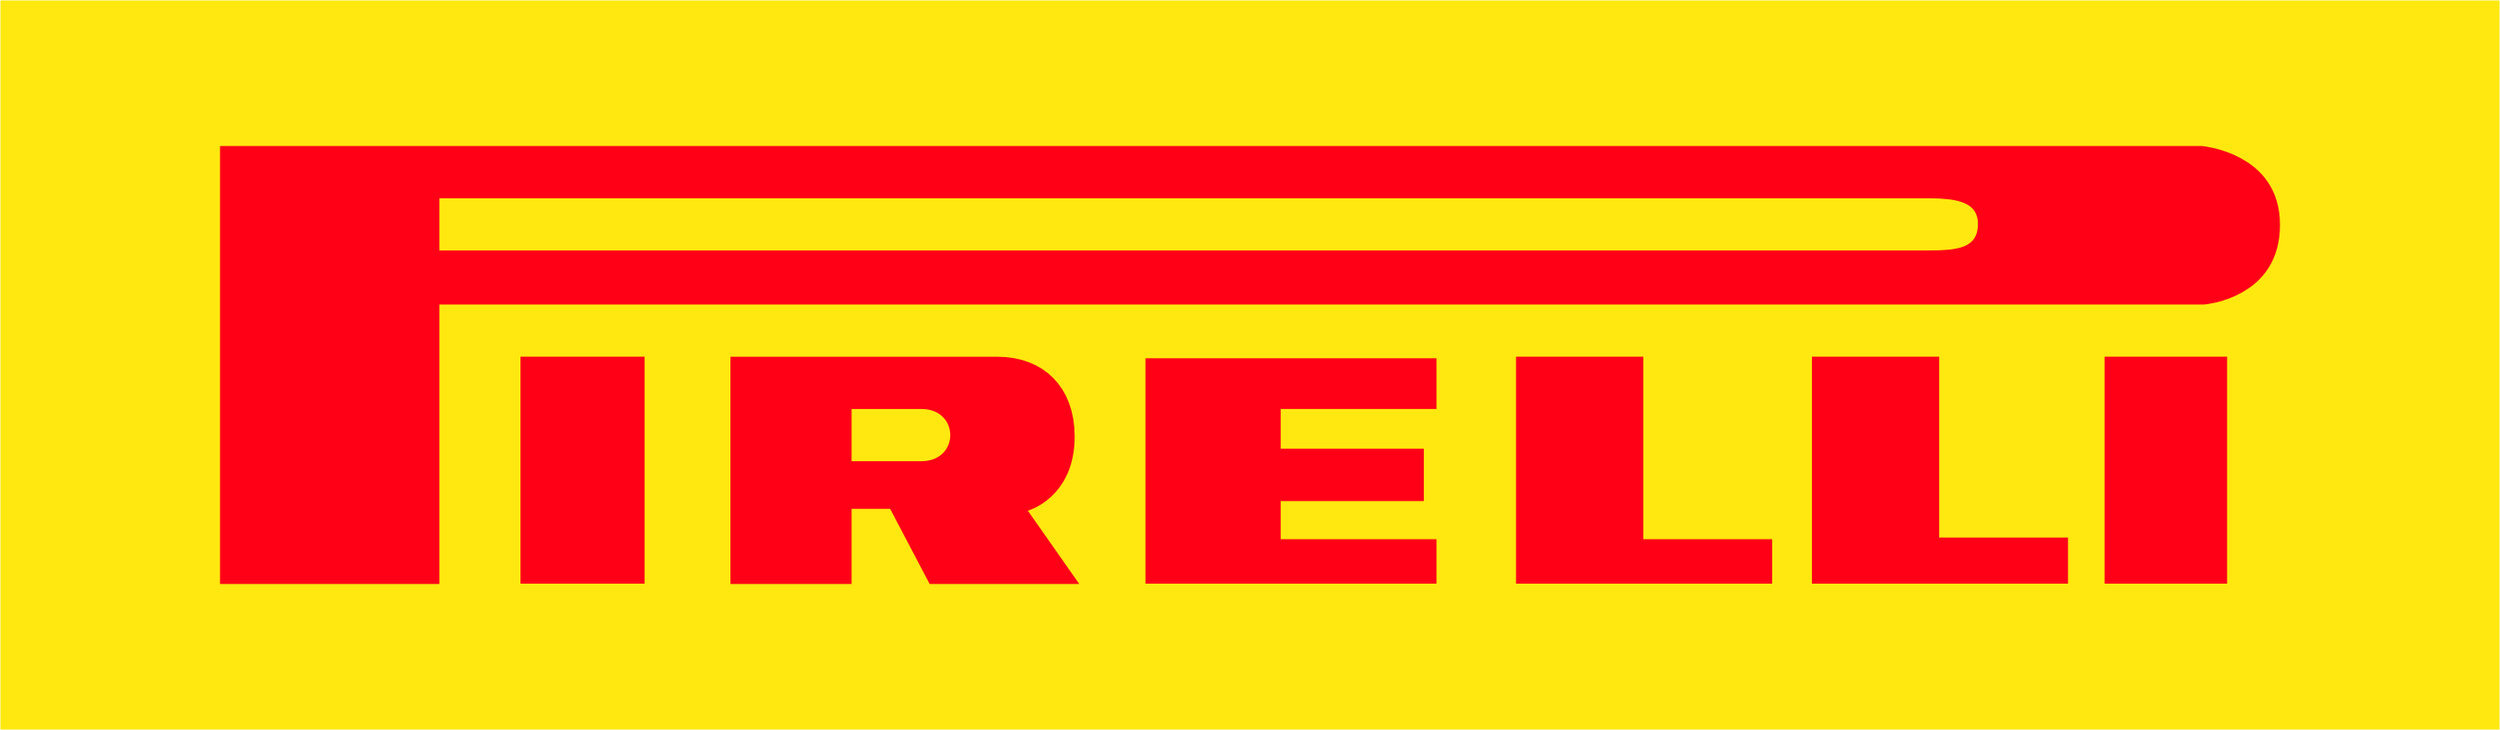 Pirelli s¢ caixa.jpg